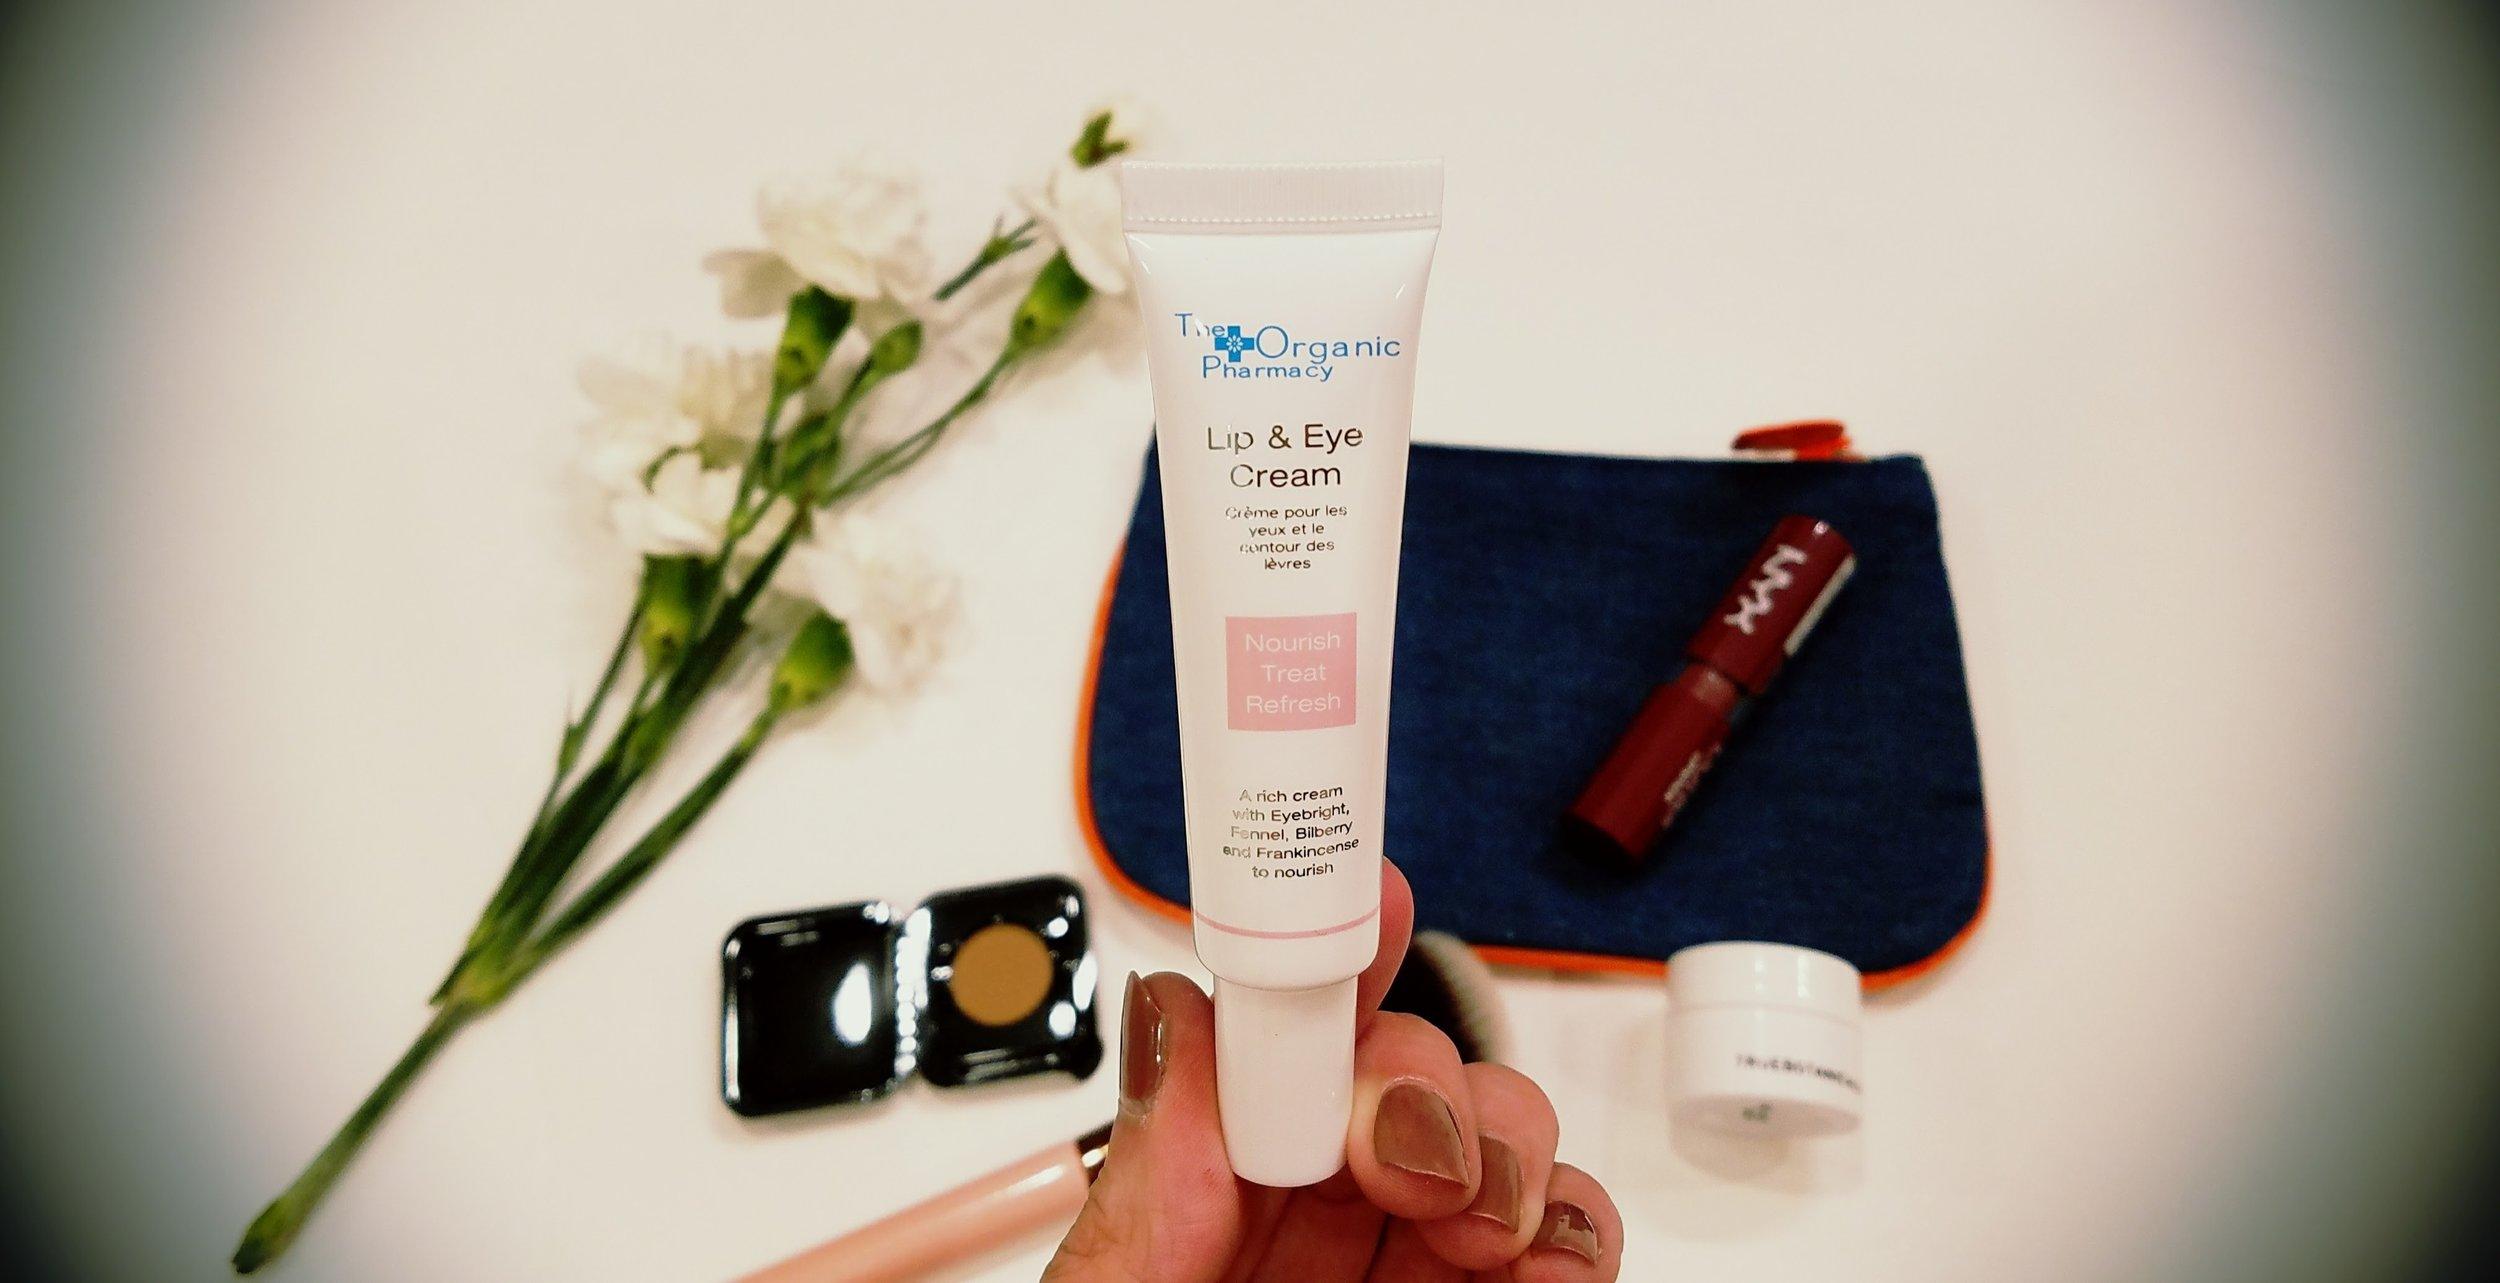 The Organic Pharmacy Lip & Eye Cream ipsy bag